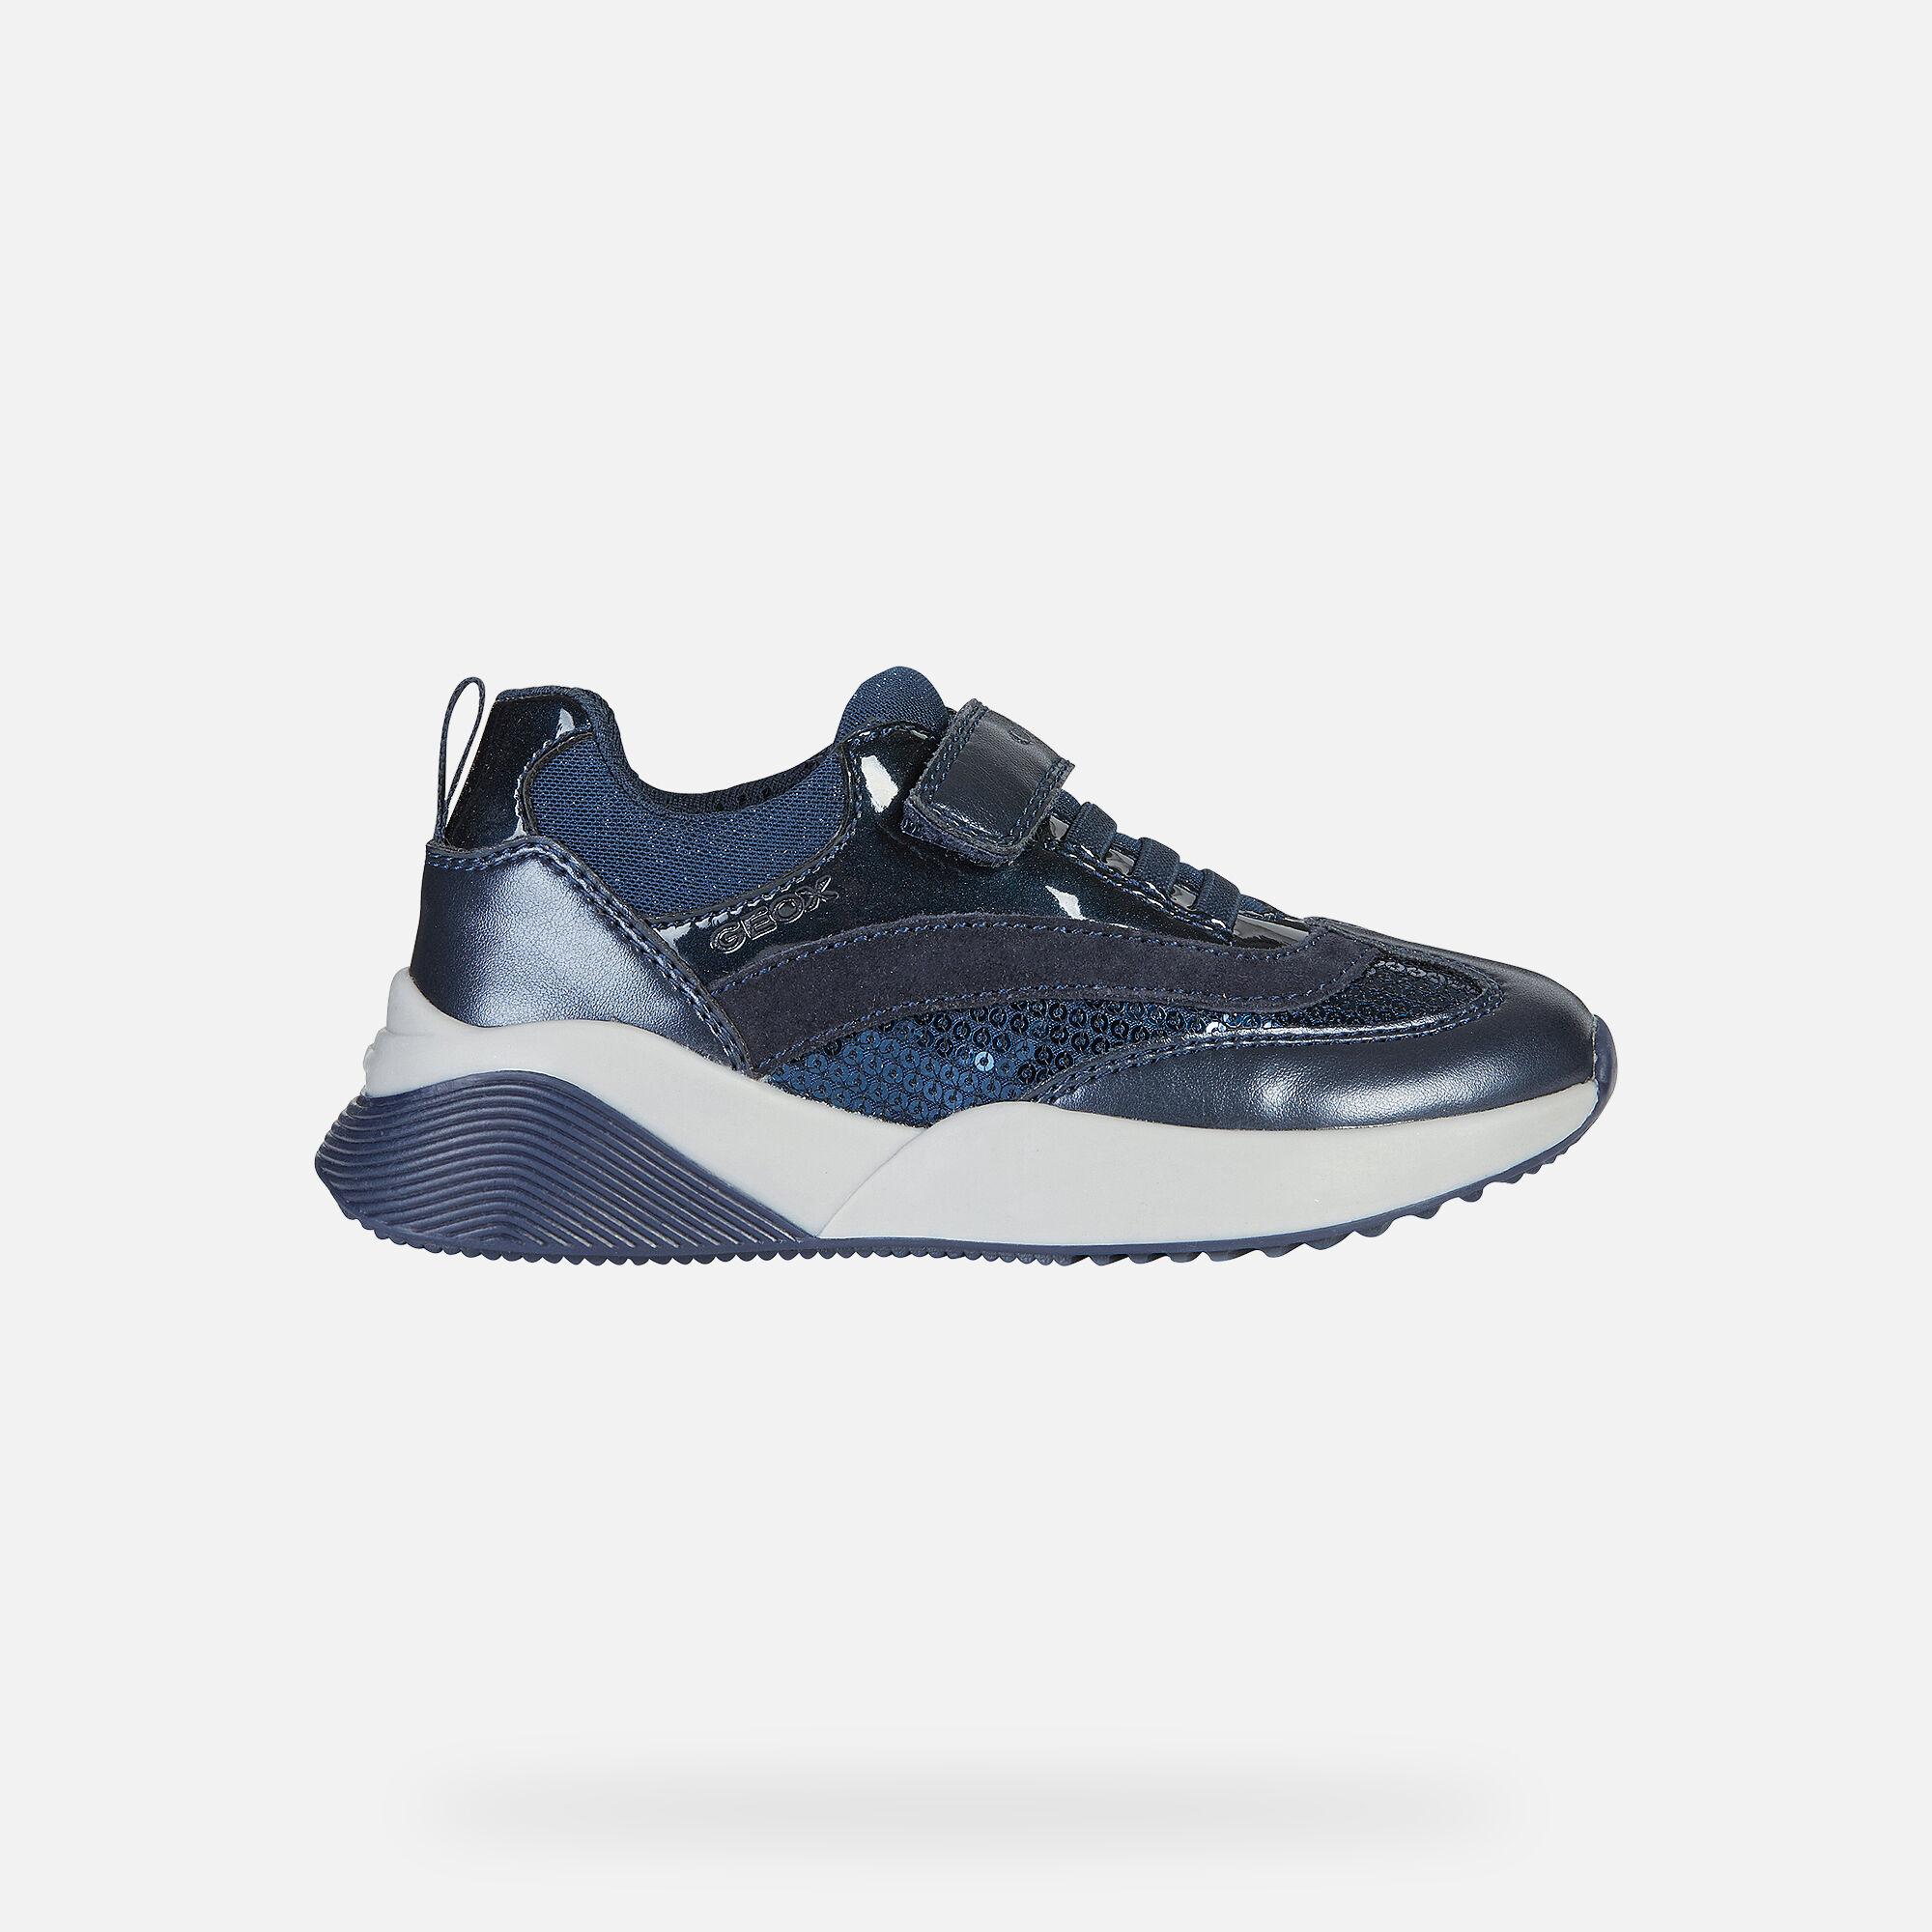 Geox SINEAD GIRL Junior Girl: Navy blue